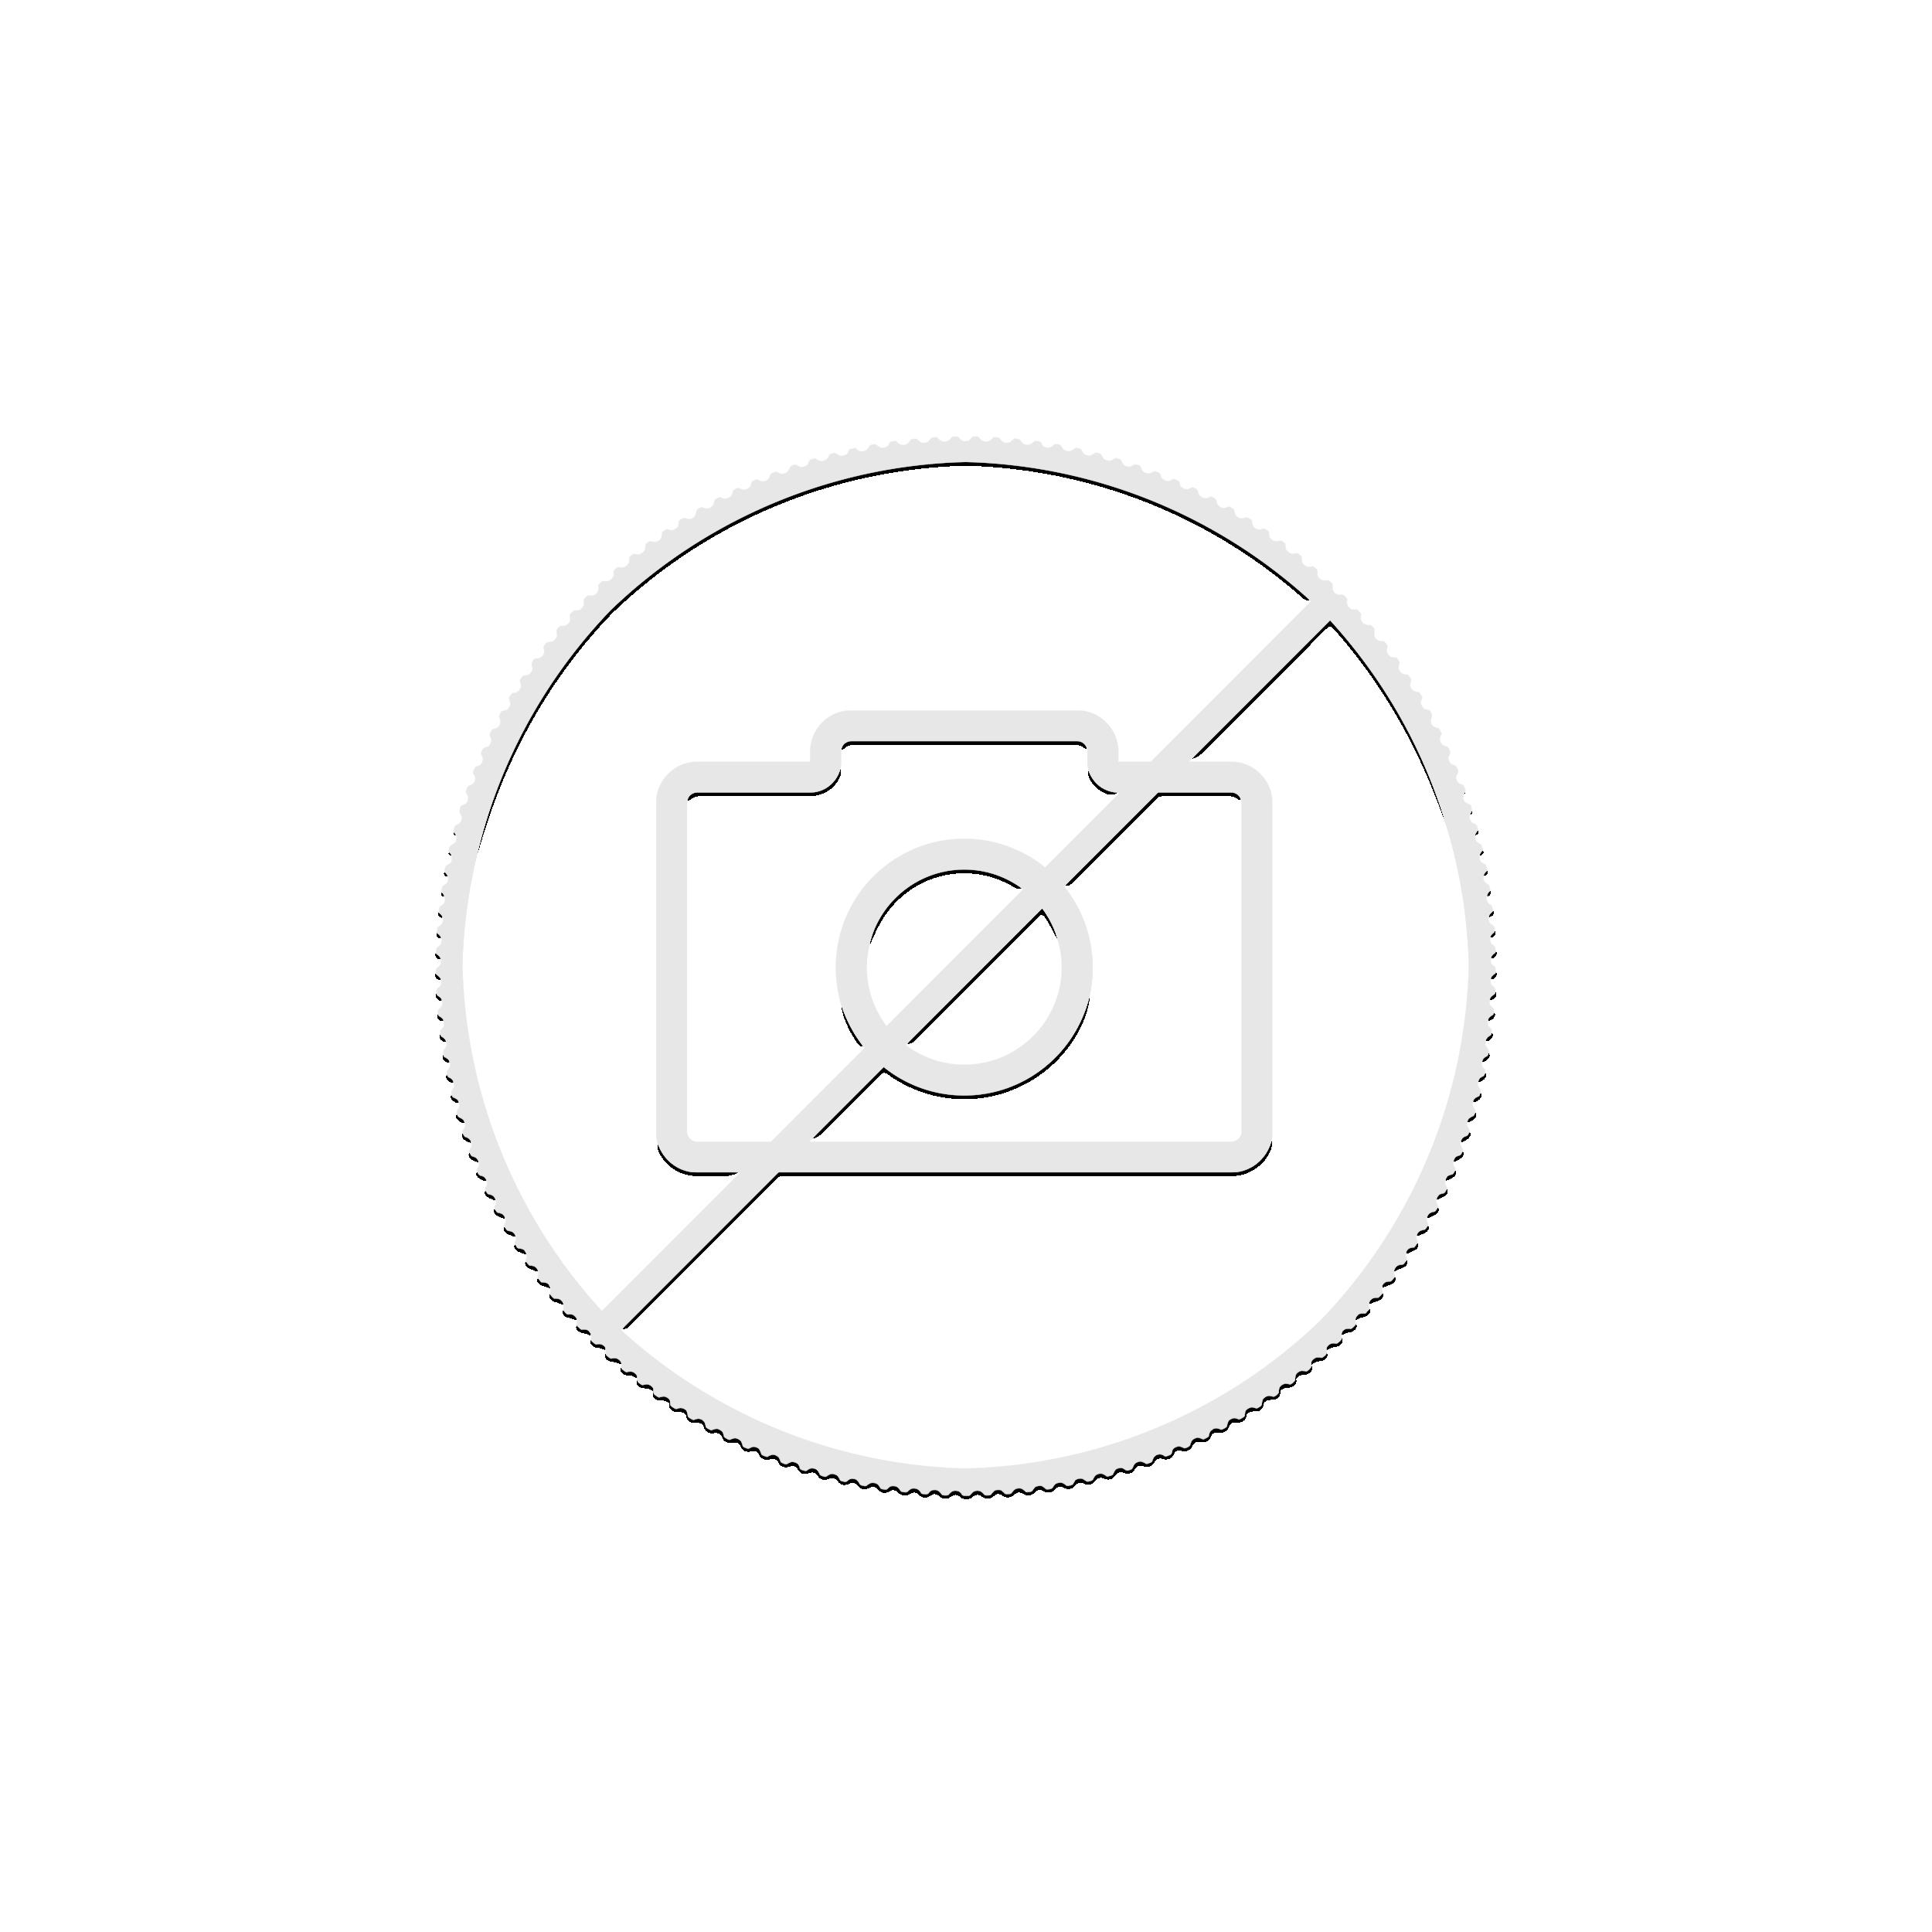 1 troy ounce zilveren munt Fraser's Dolphin 2021